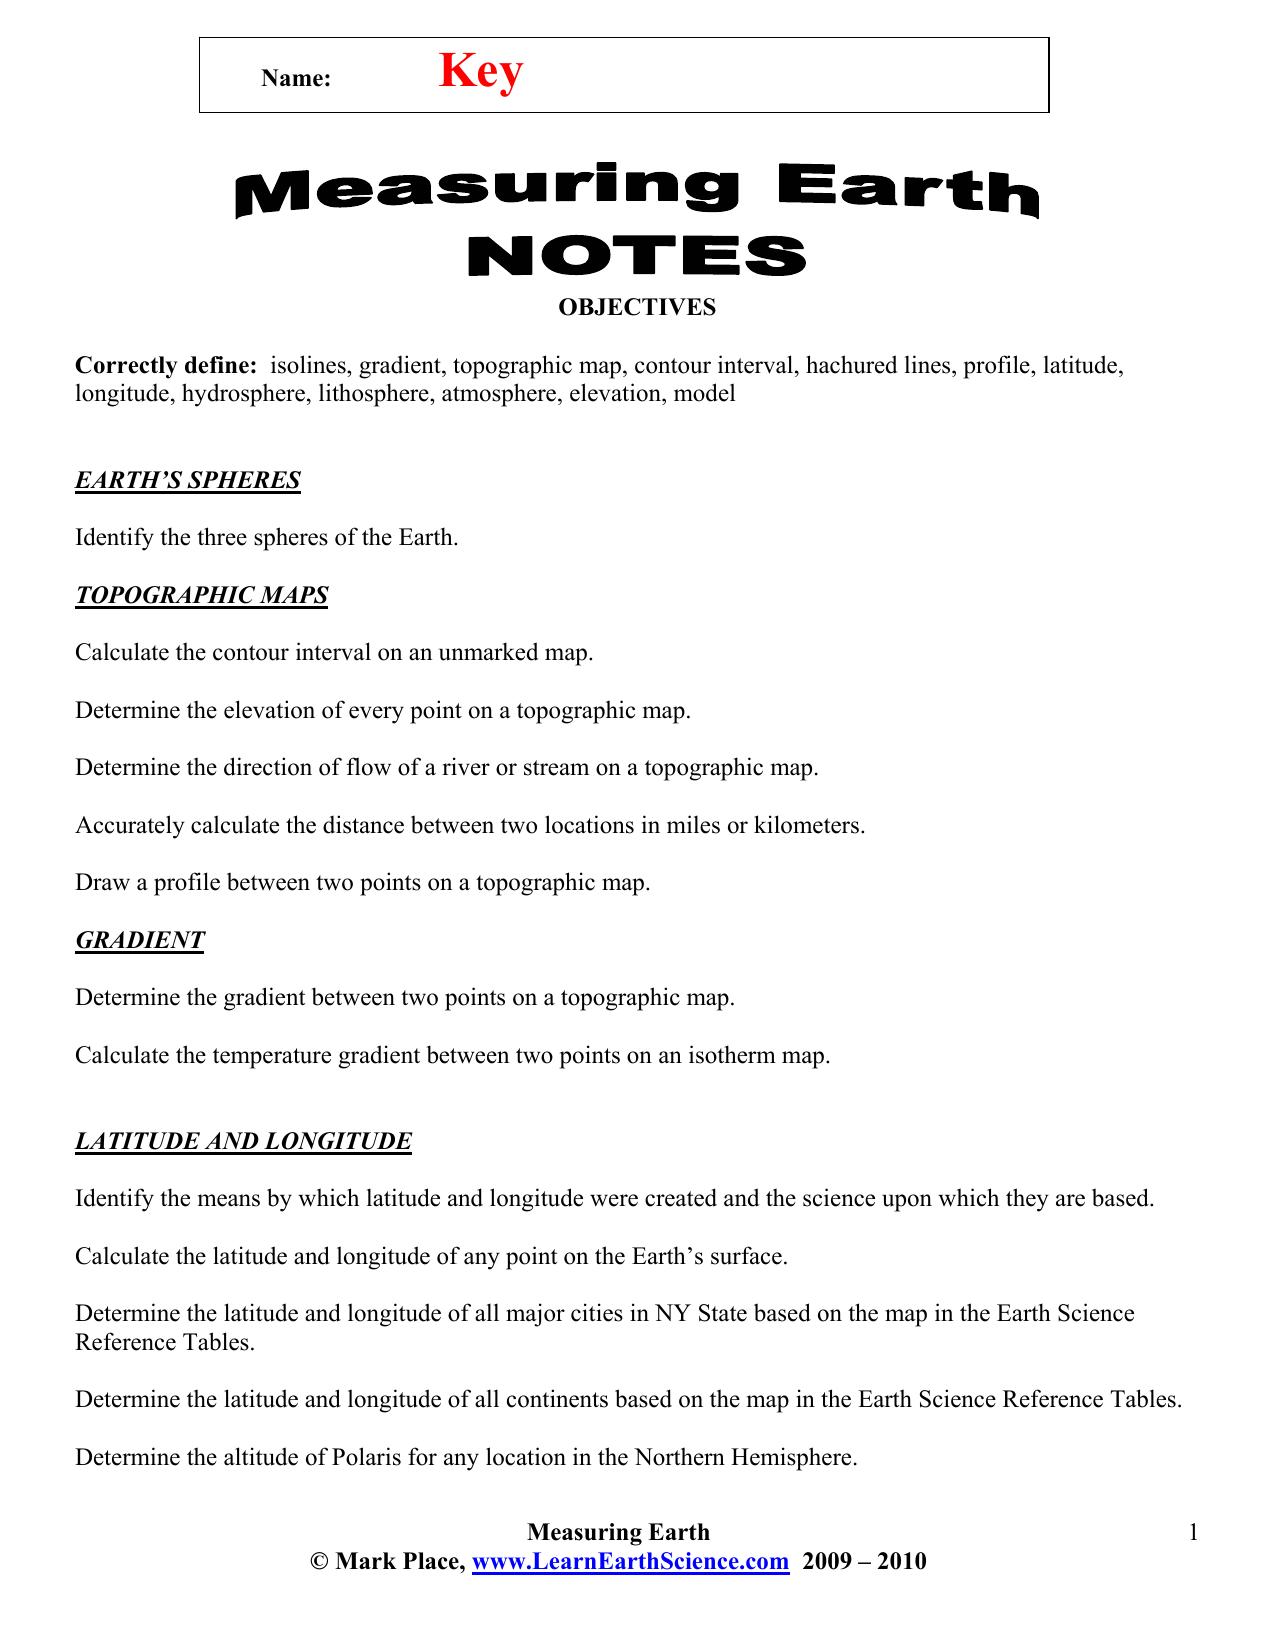 Measuring Earth Notes Key